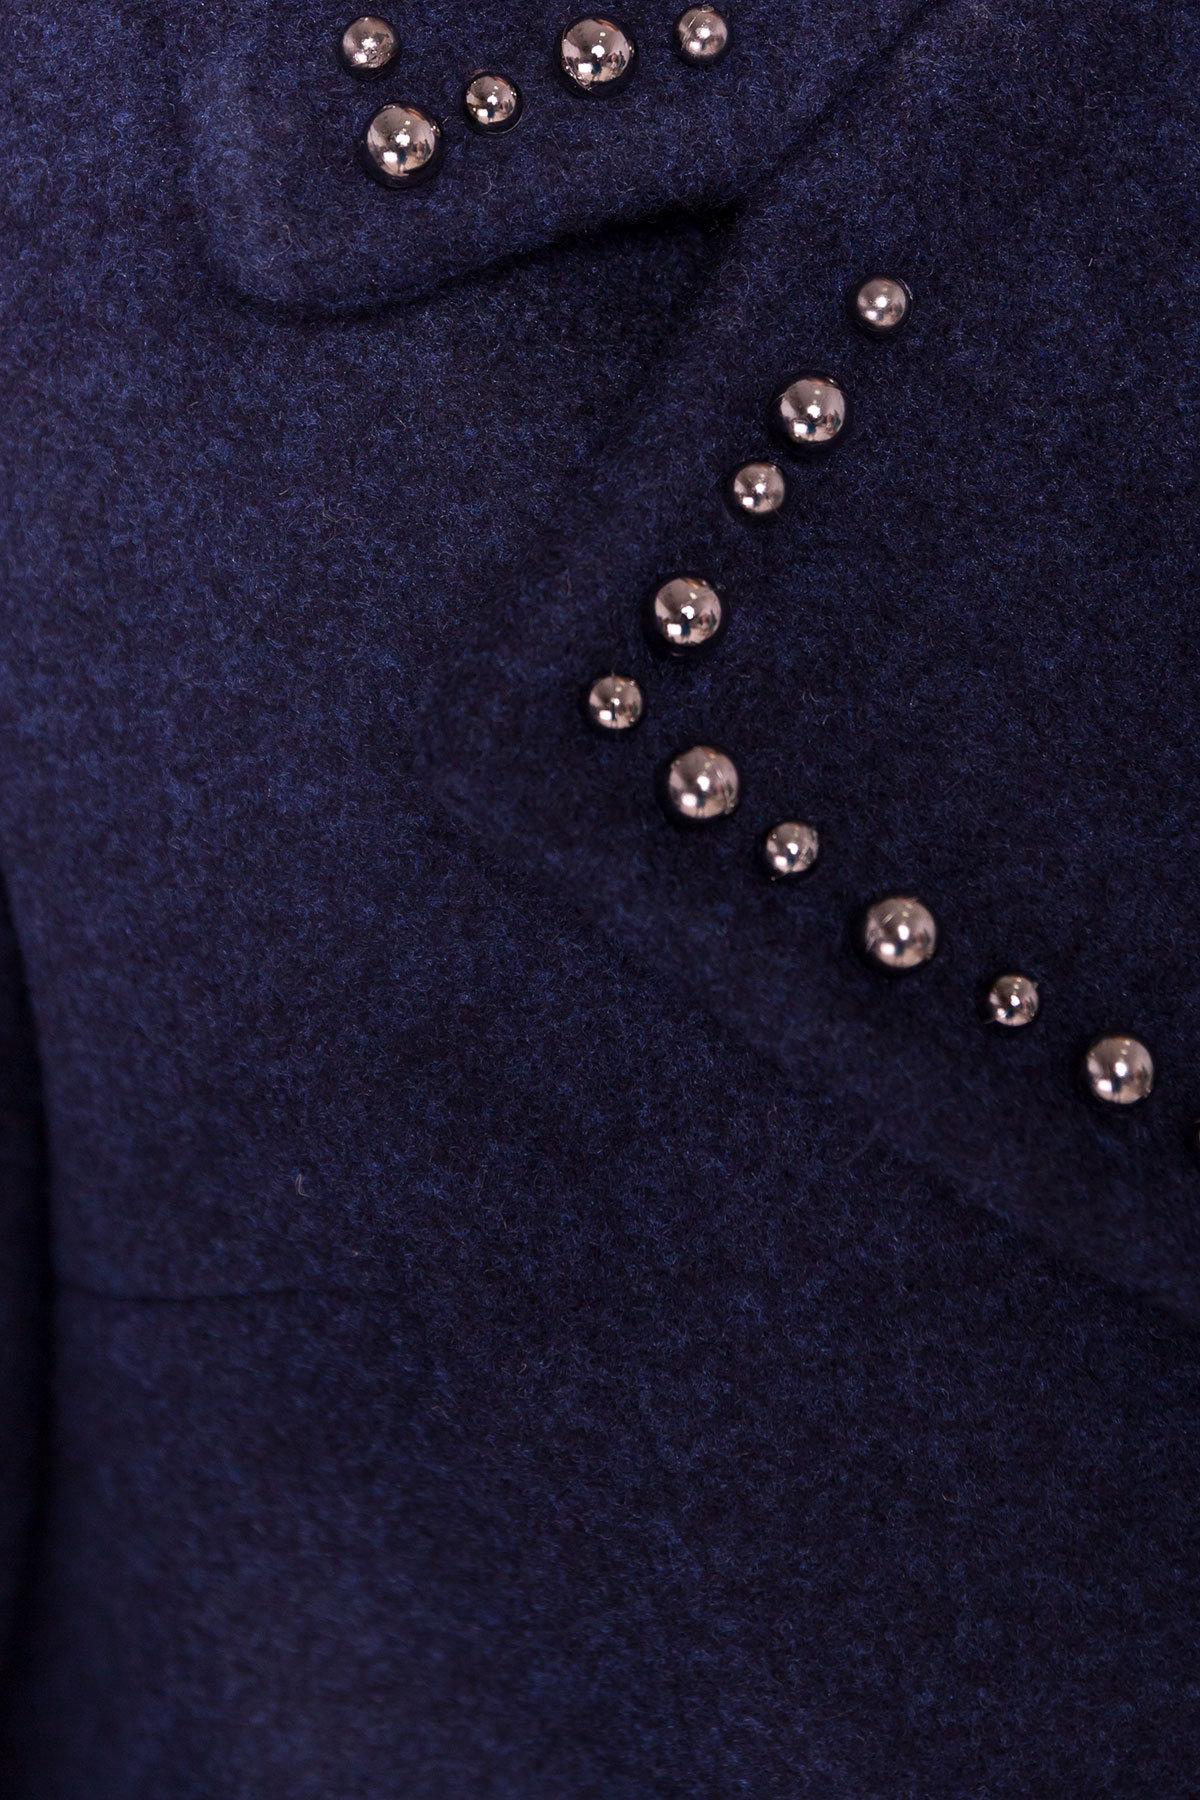 Пальто Кейси 5504 АРТ. 37032 Цвет: Темно-синий 17 - фото 6, интернет магазин tm-modus.ru